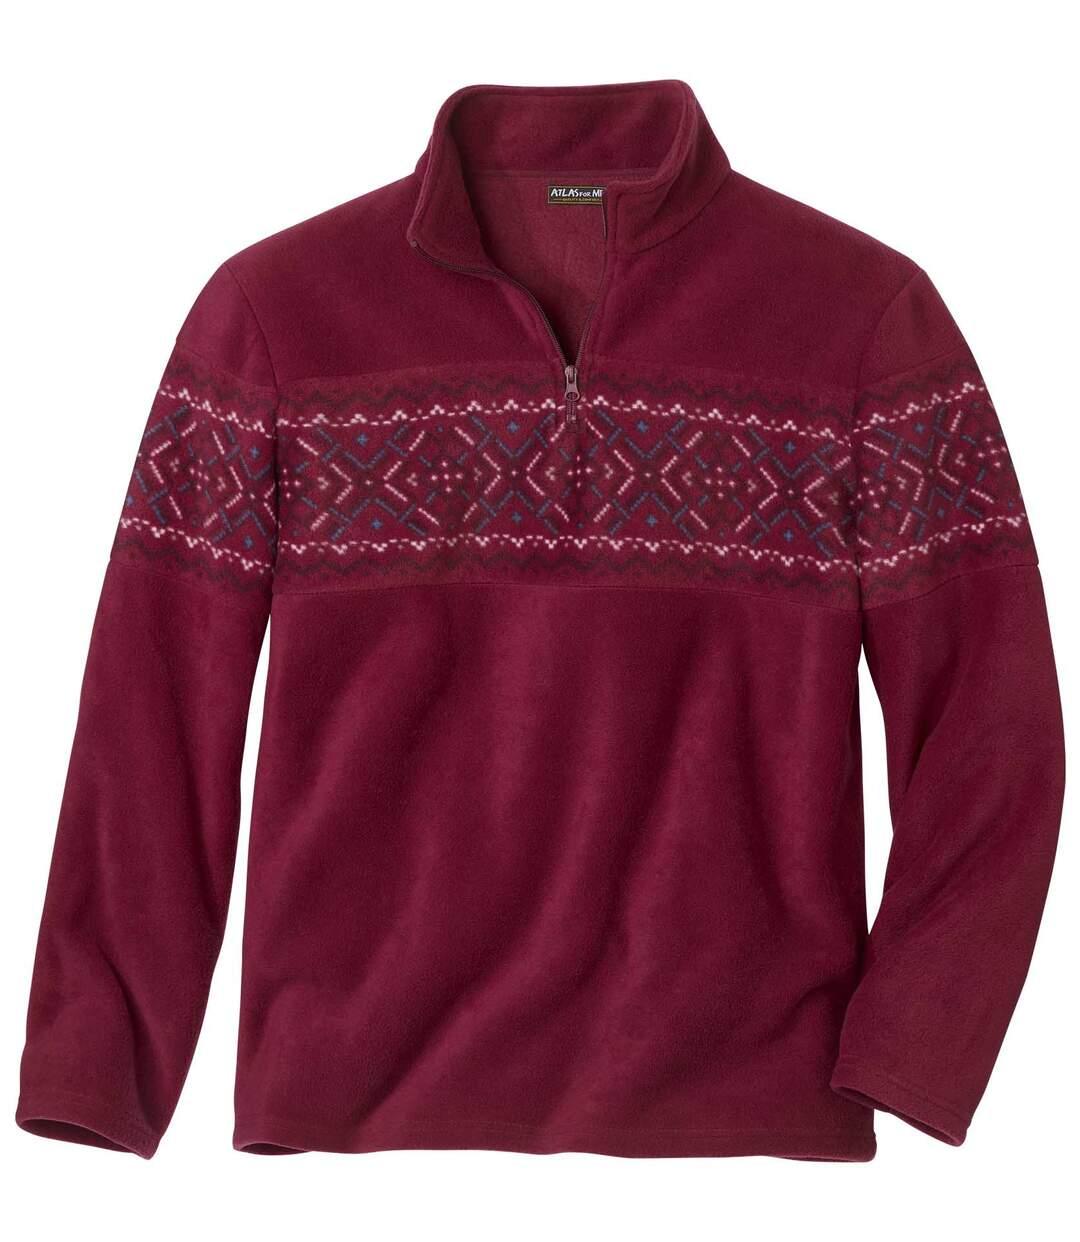 Fleecesweater Jacquard Oslo